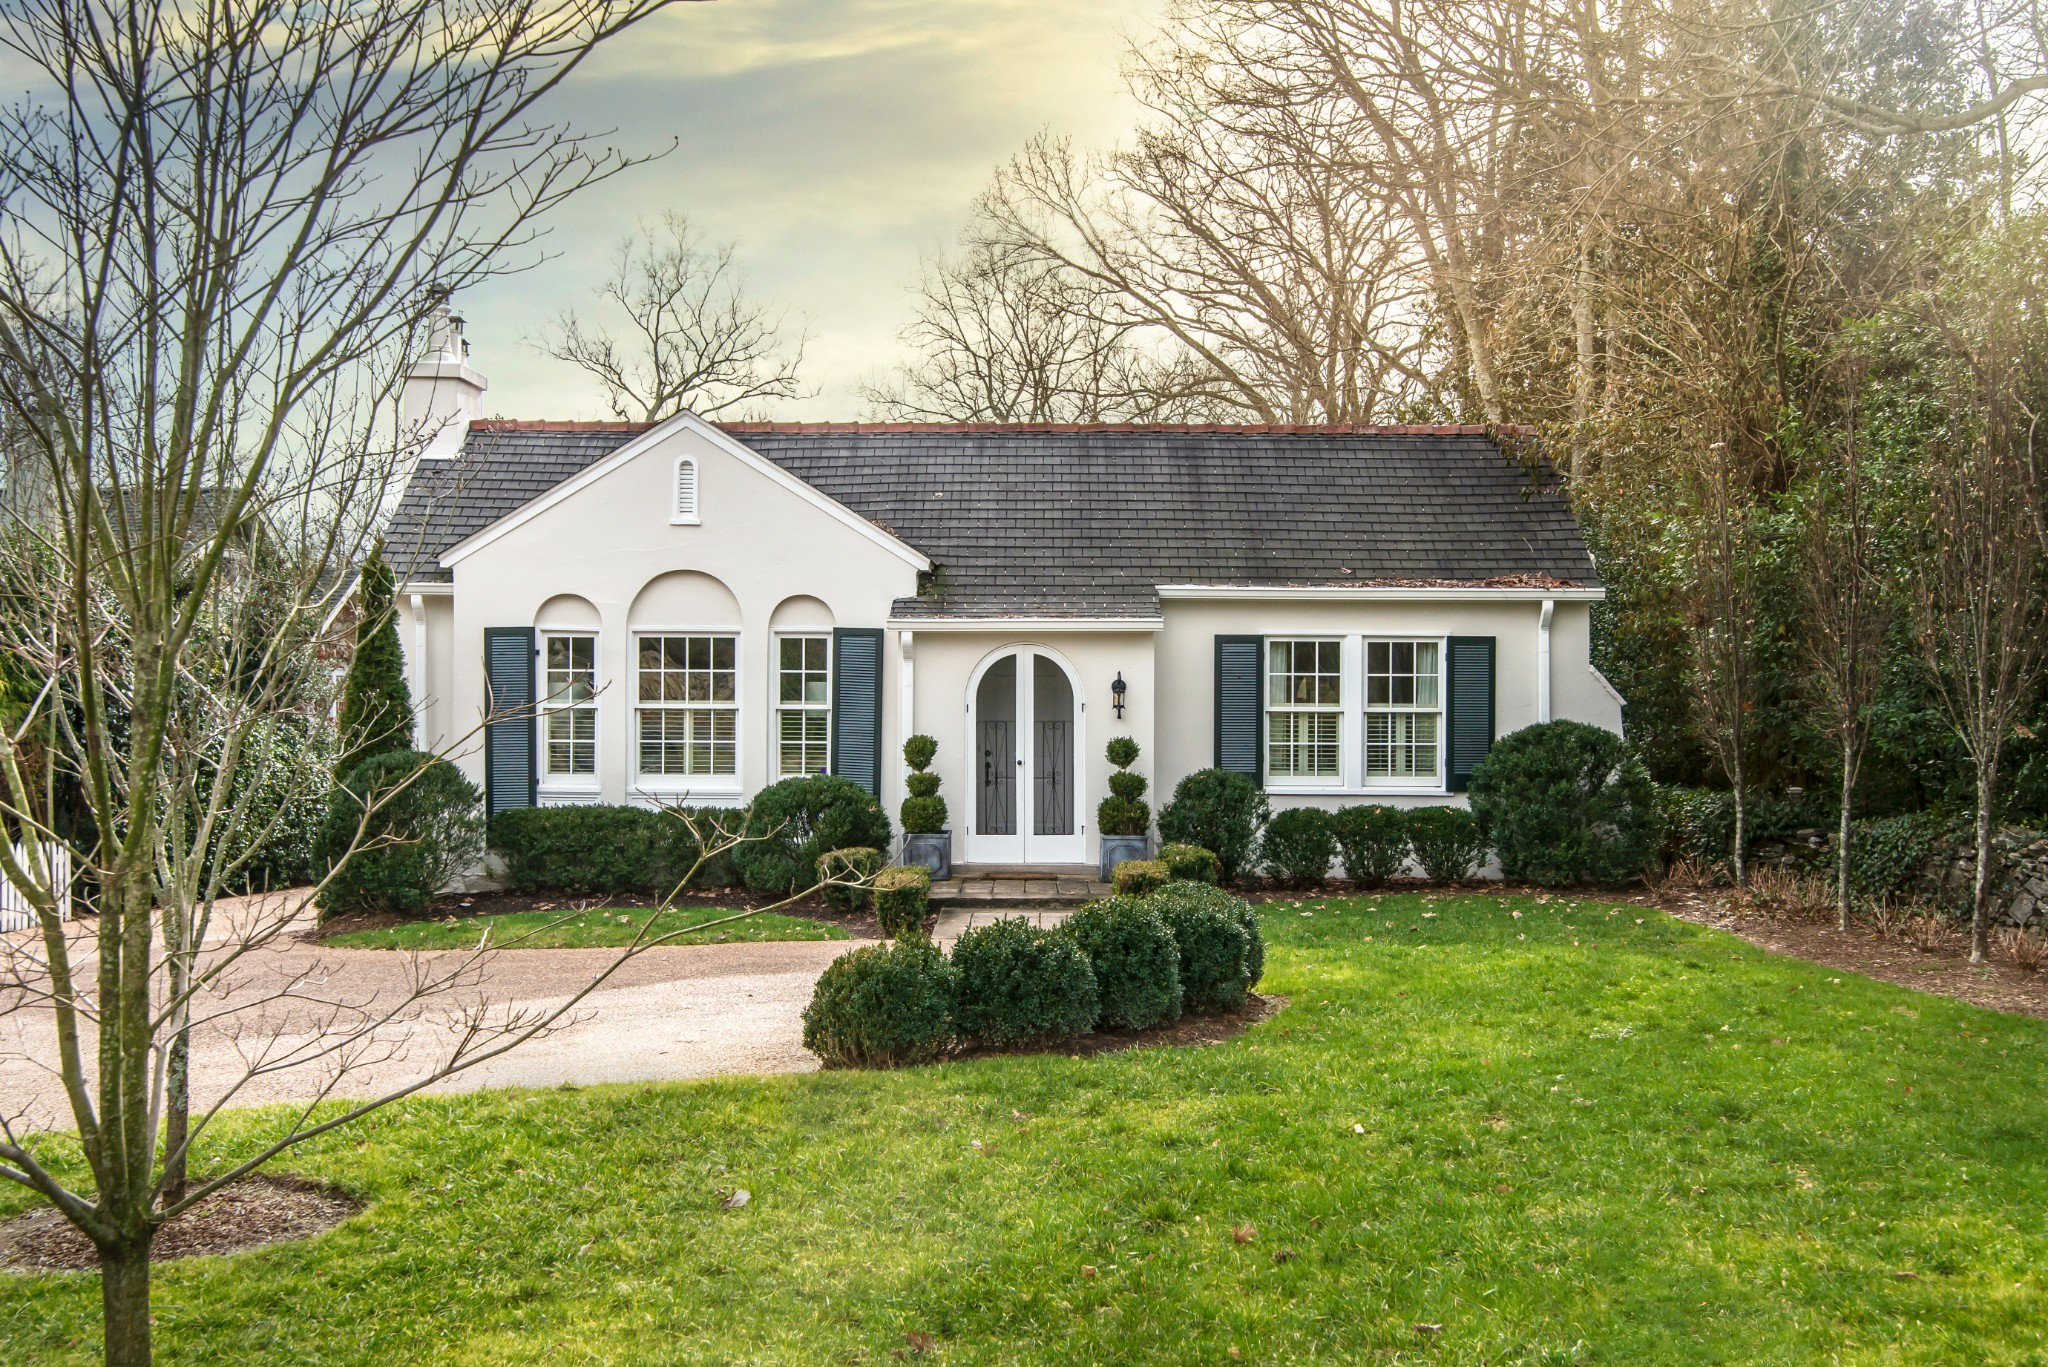 4407 Harding Pl, Nashville, TN 37205 - Nashville, TN real estate listing